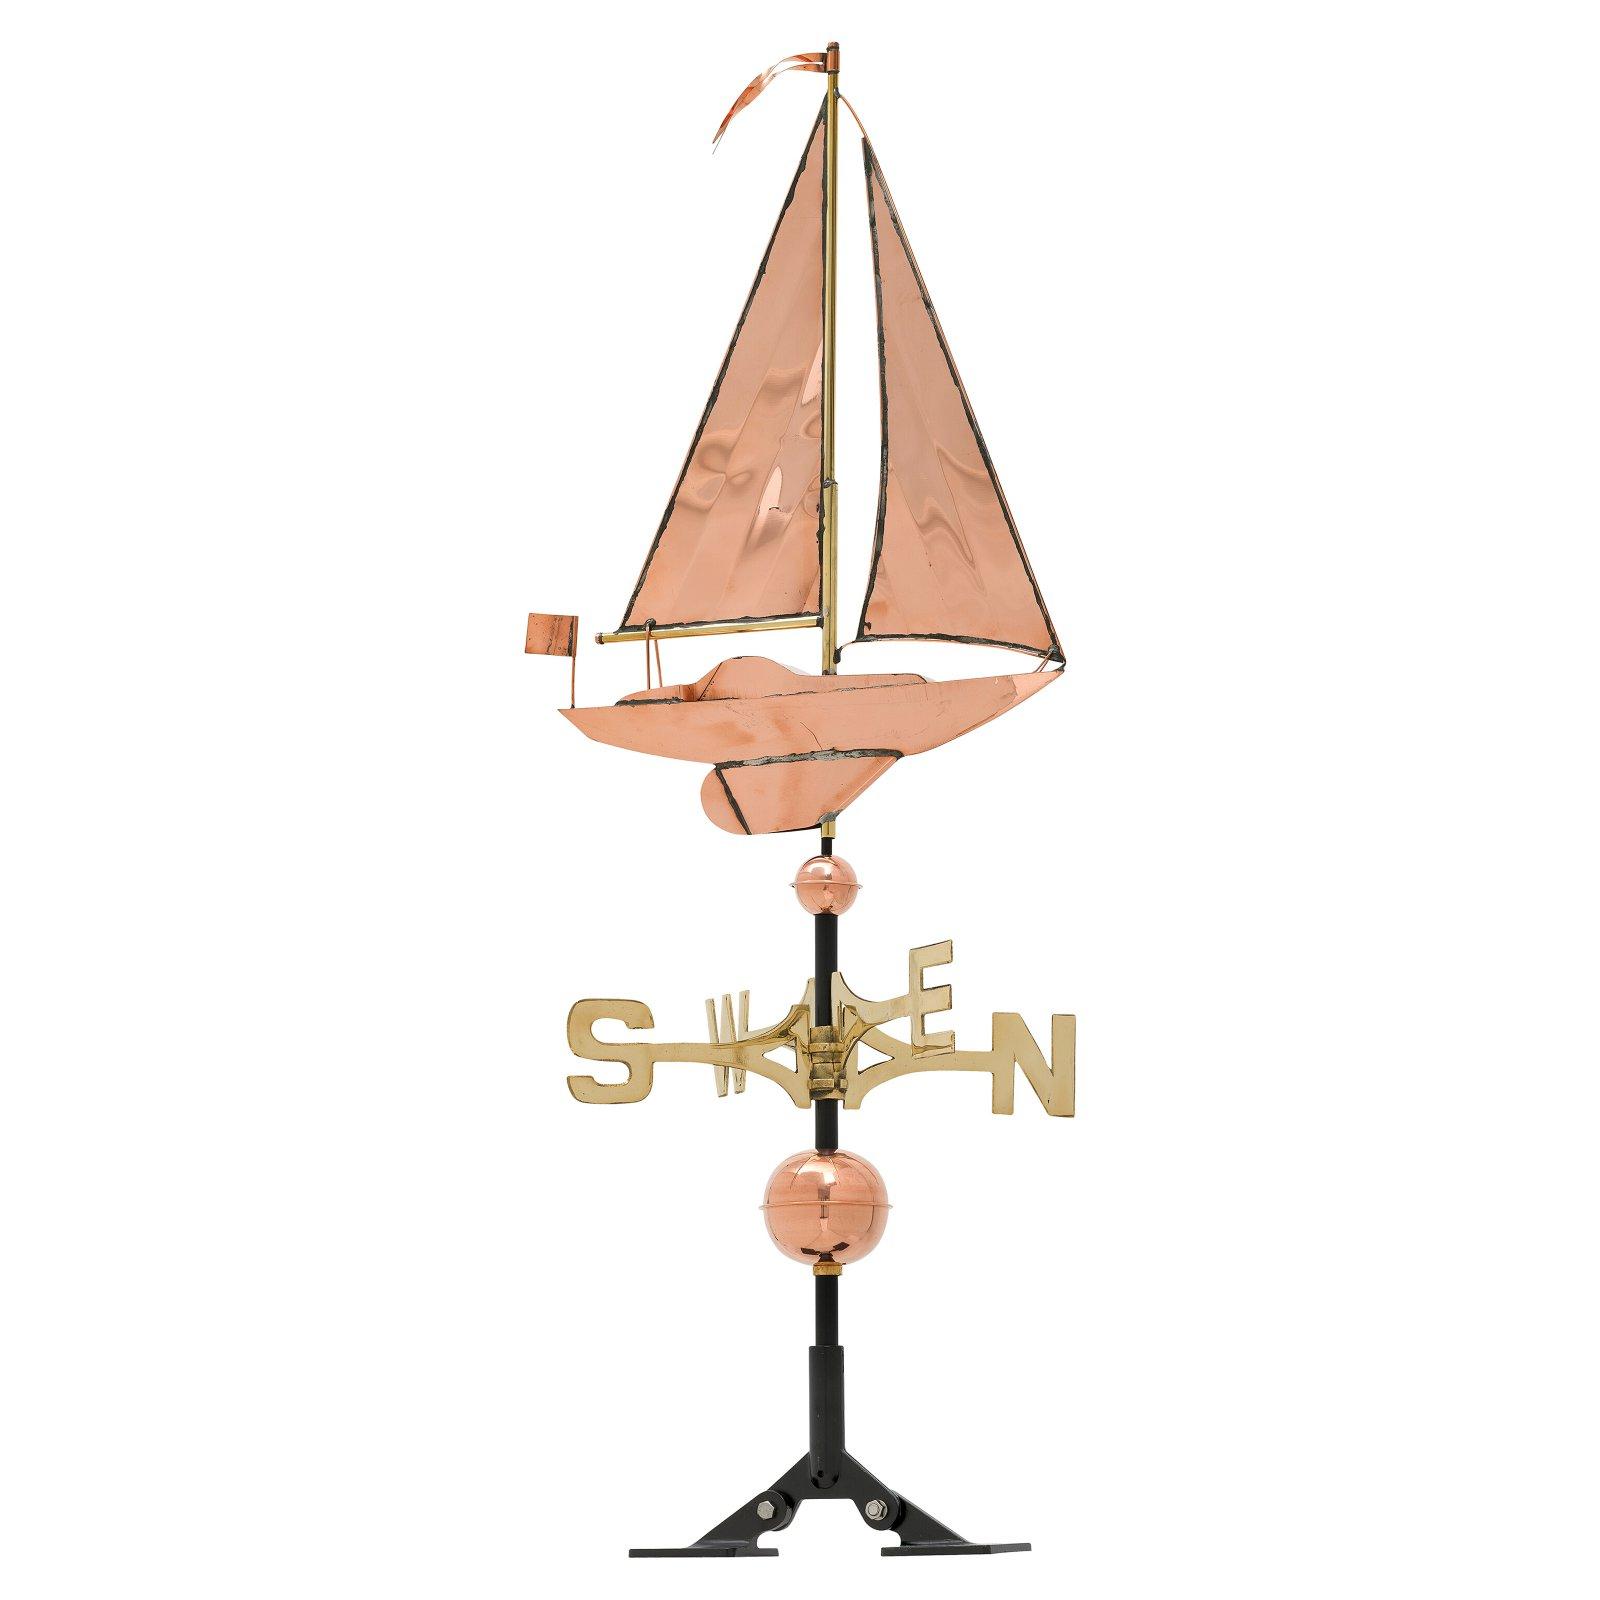 Fleeting Sailboat